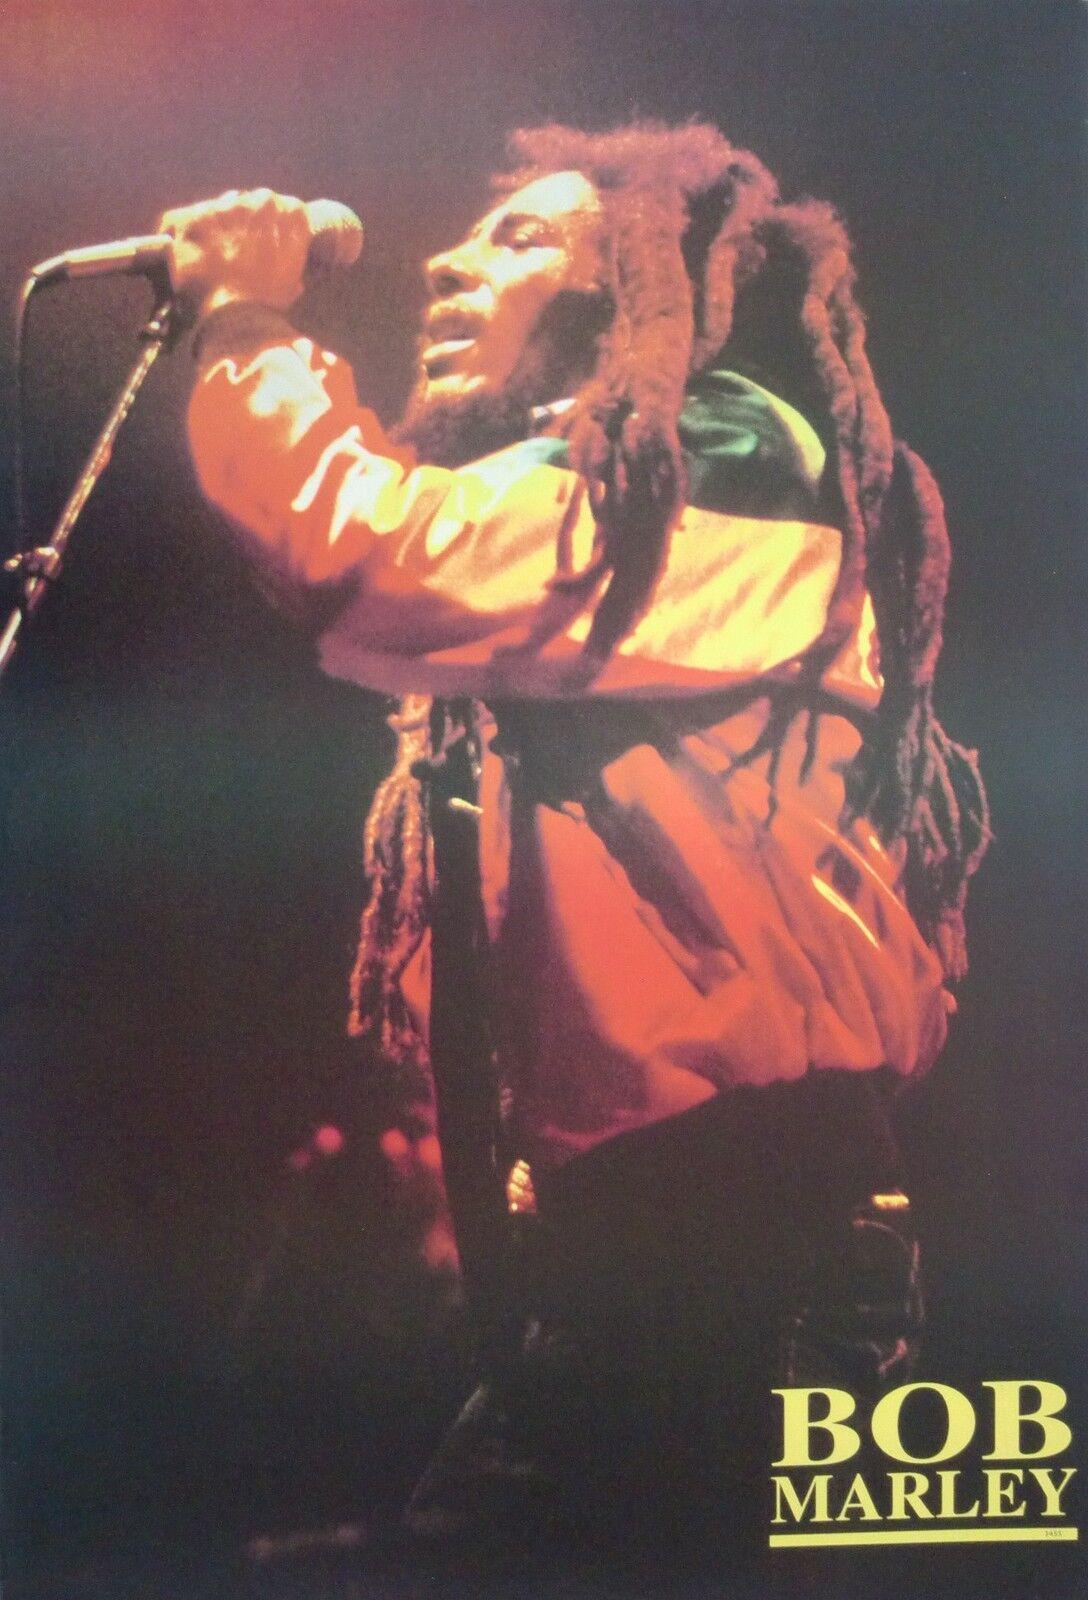 bob marley holding mic singing poster from asia reggae ska rocksteady ebay. Black Bedroom Furniture Sets. Home Design Ideas